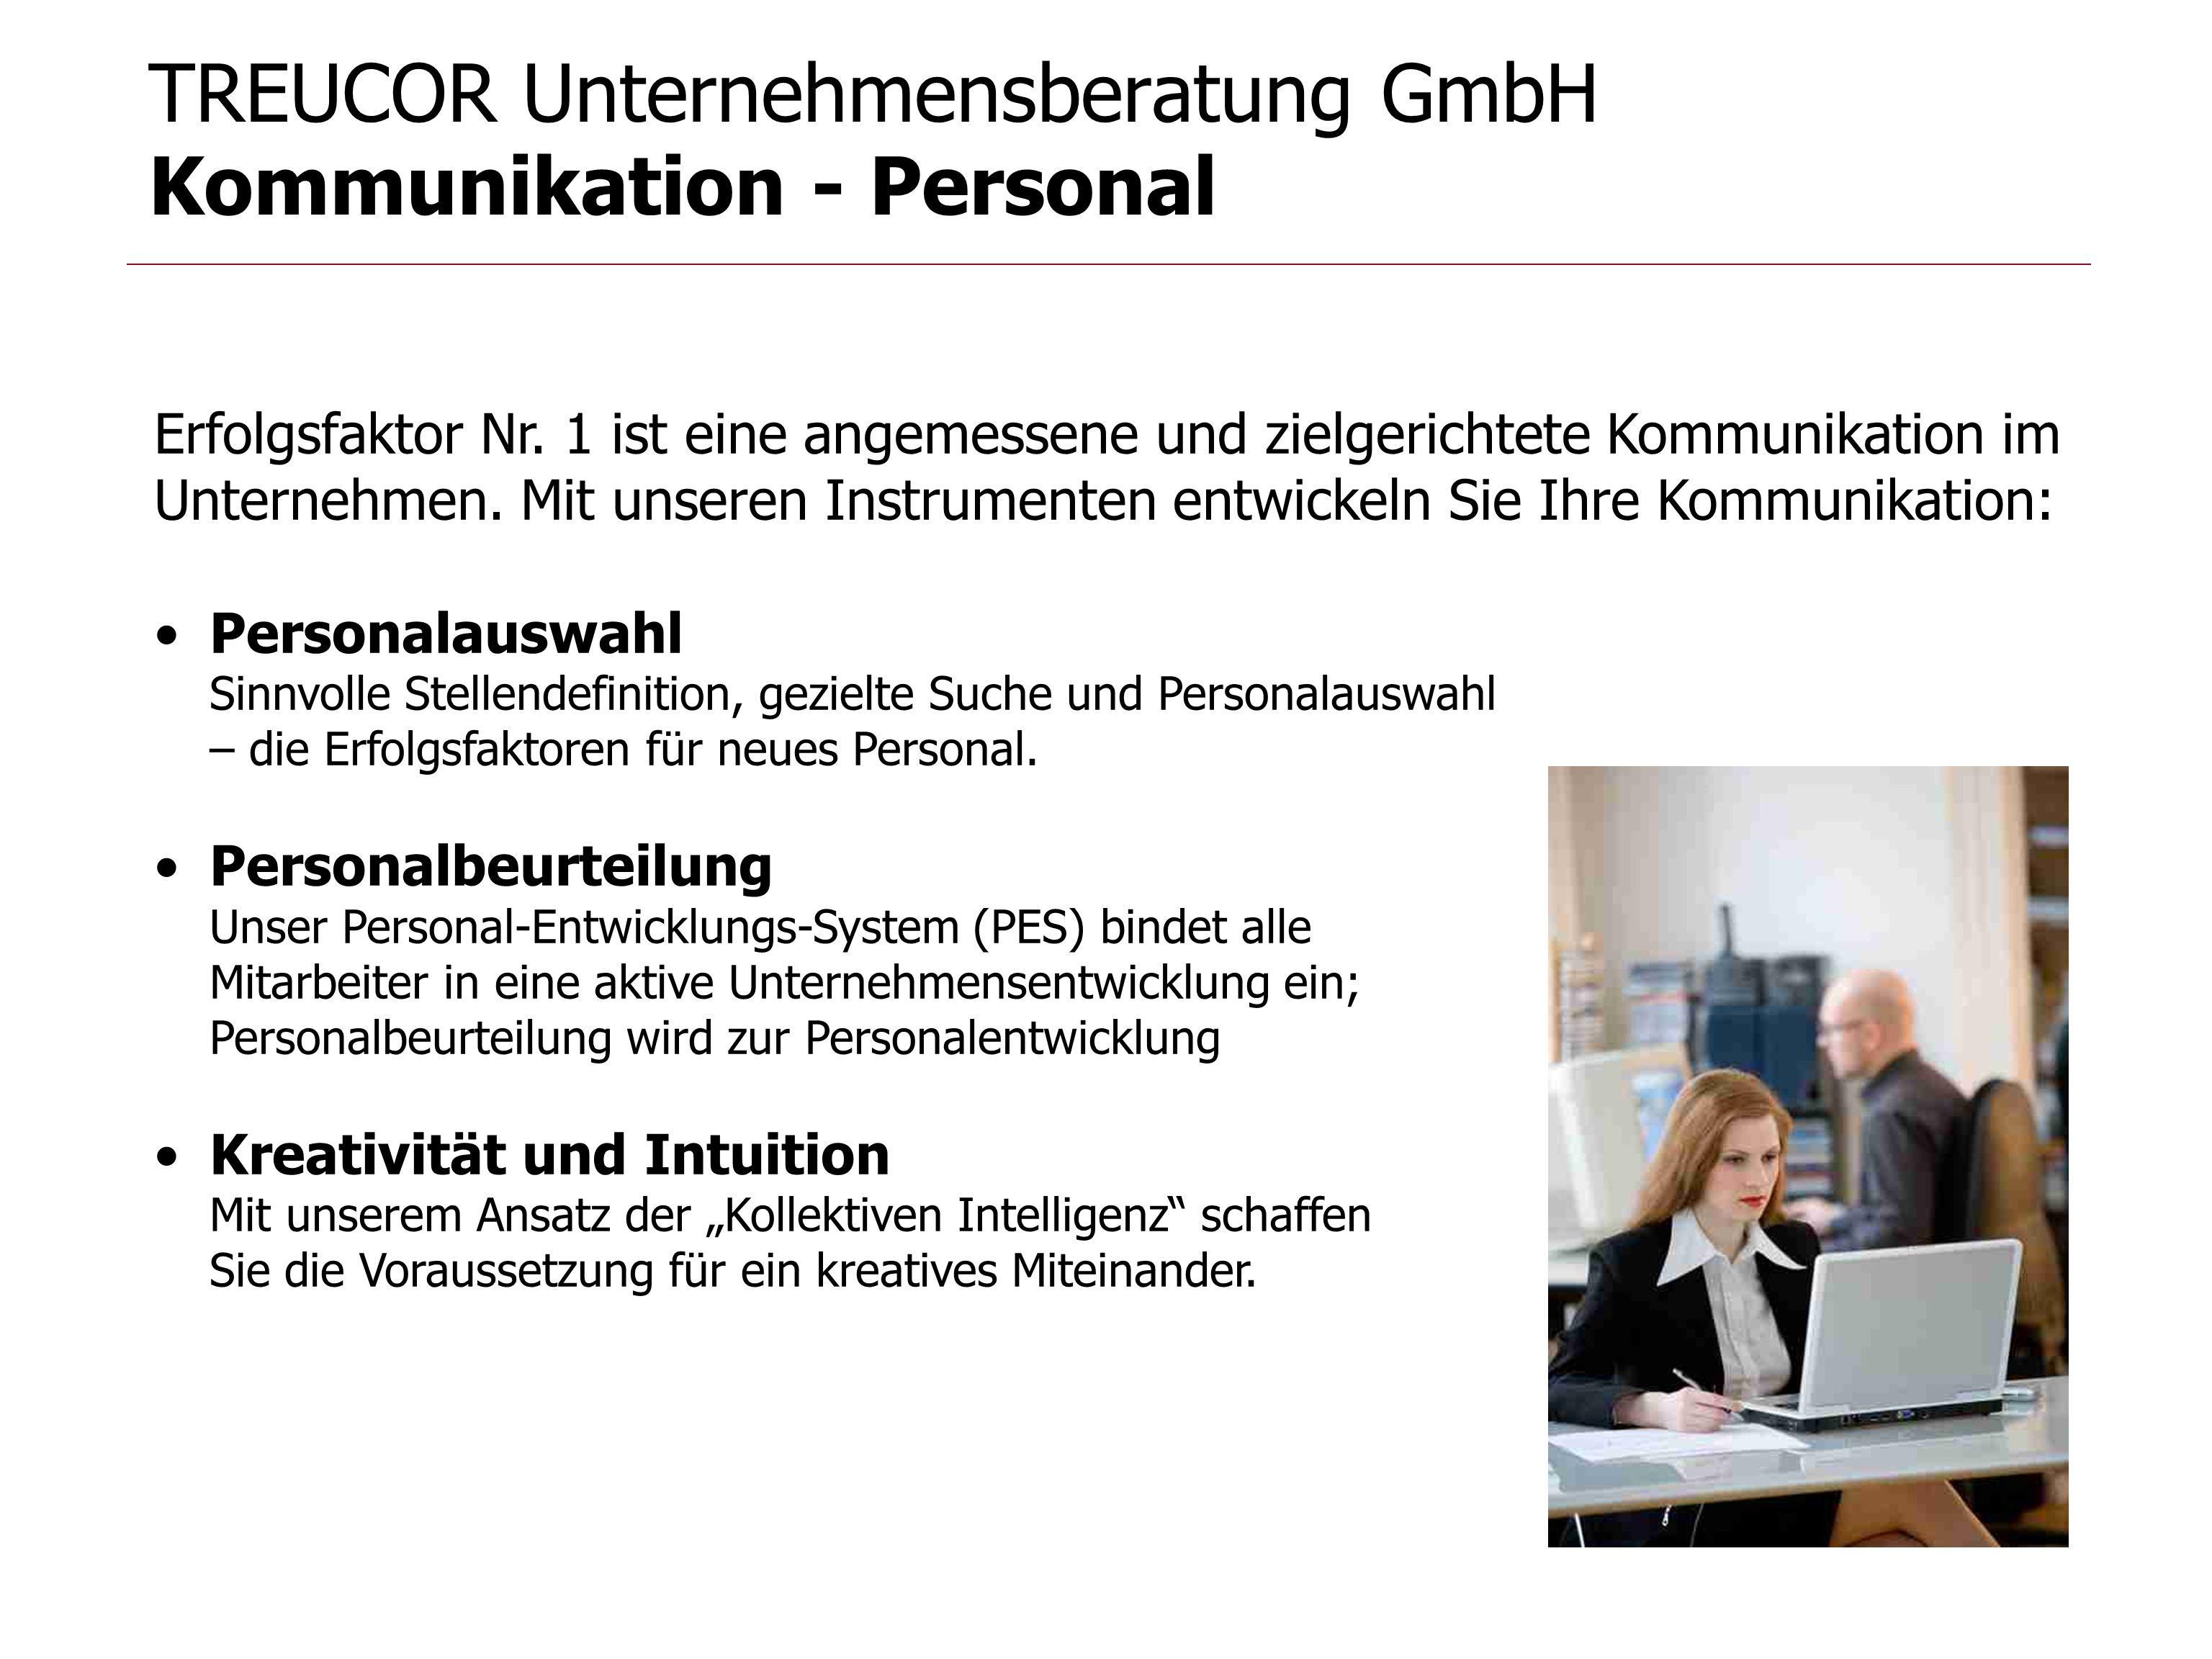 TREUCOR Unternehmensberatung GmbH Kommunikation - Personal